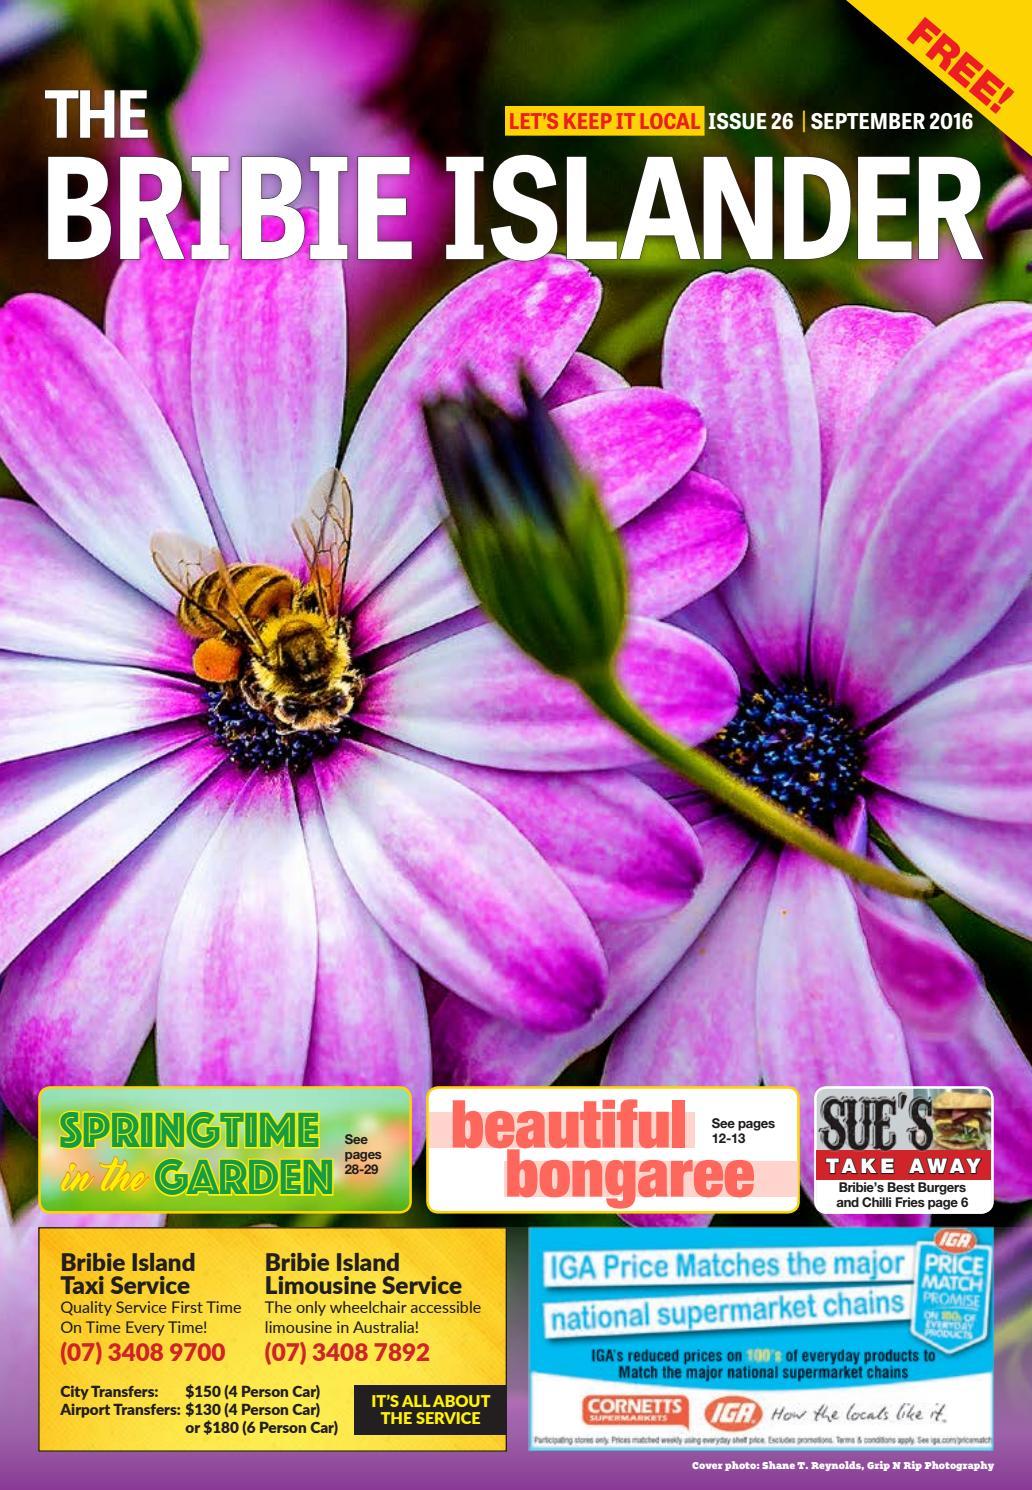 The Bribie Islander September 2016 Issue 26 By Enviro Maxx Wire Harness Issuu